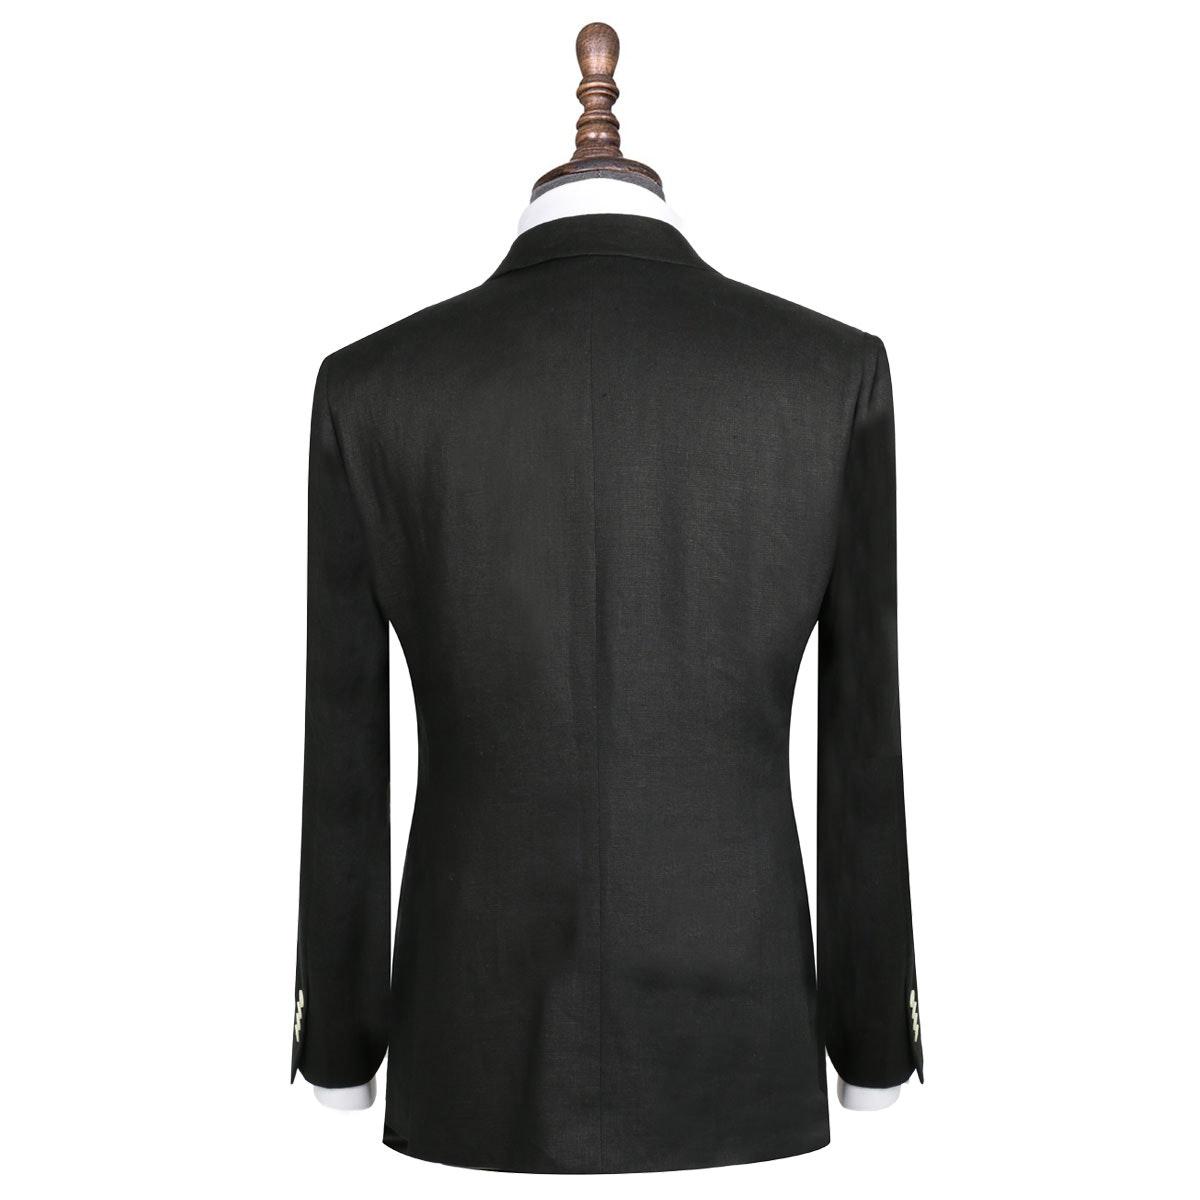 InStitchu Collection The Manhattan Black Linen Jacket